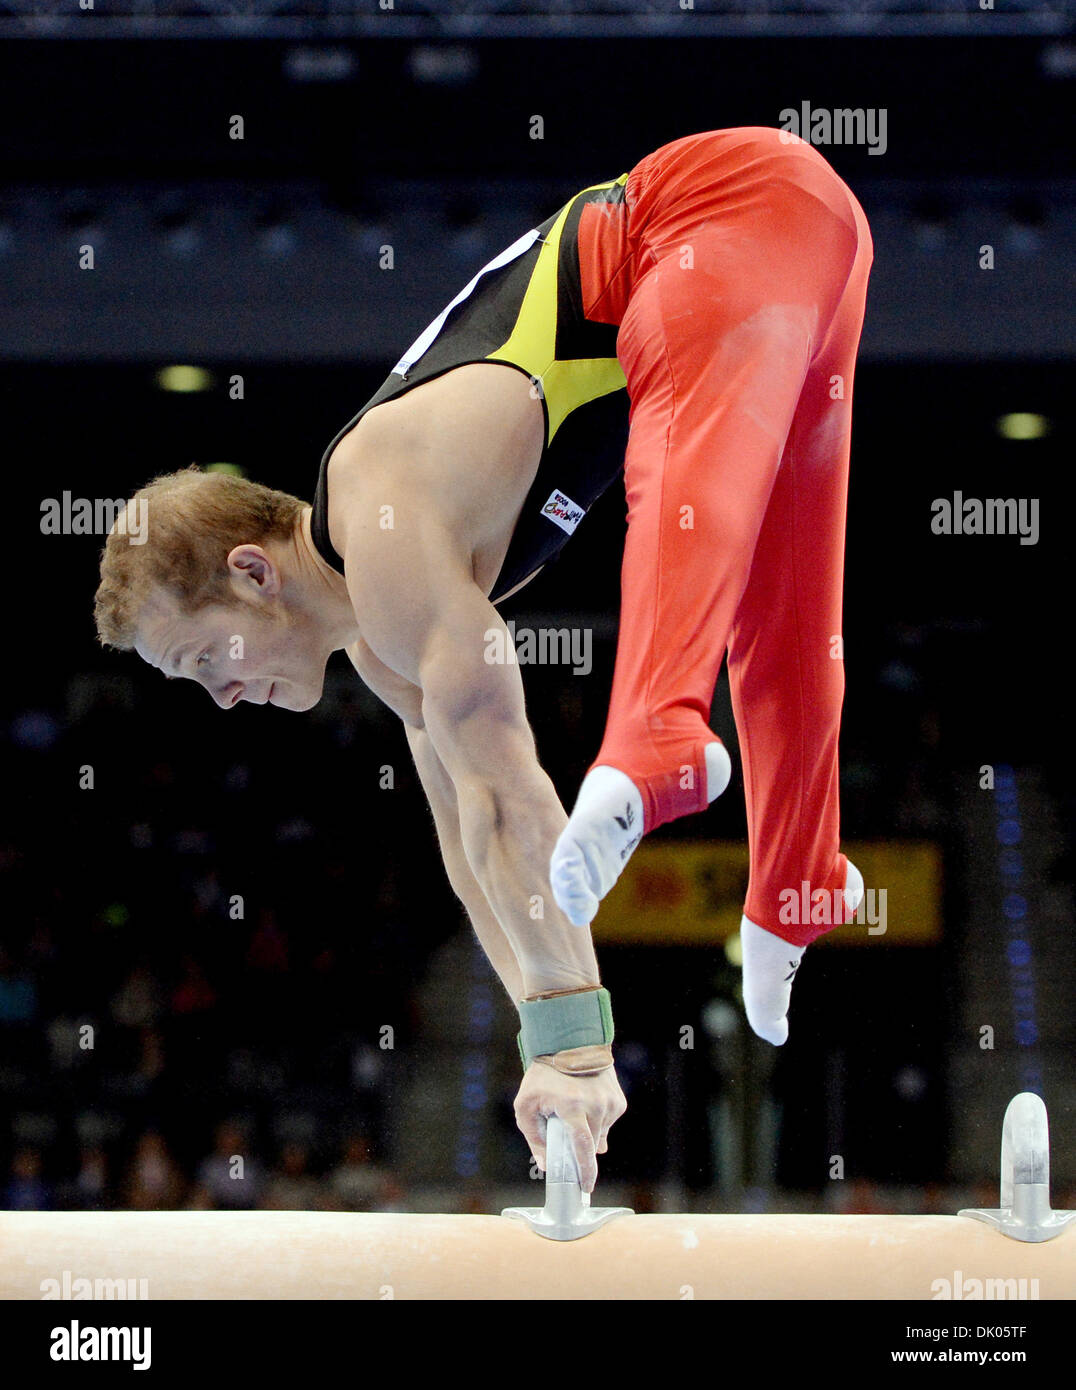 Stuttgart, Germany. 1st Dec 2013.Germany's Fabian Hambuechen at the pommel horse during the Gymnastics World Cup. Stock Photo